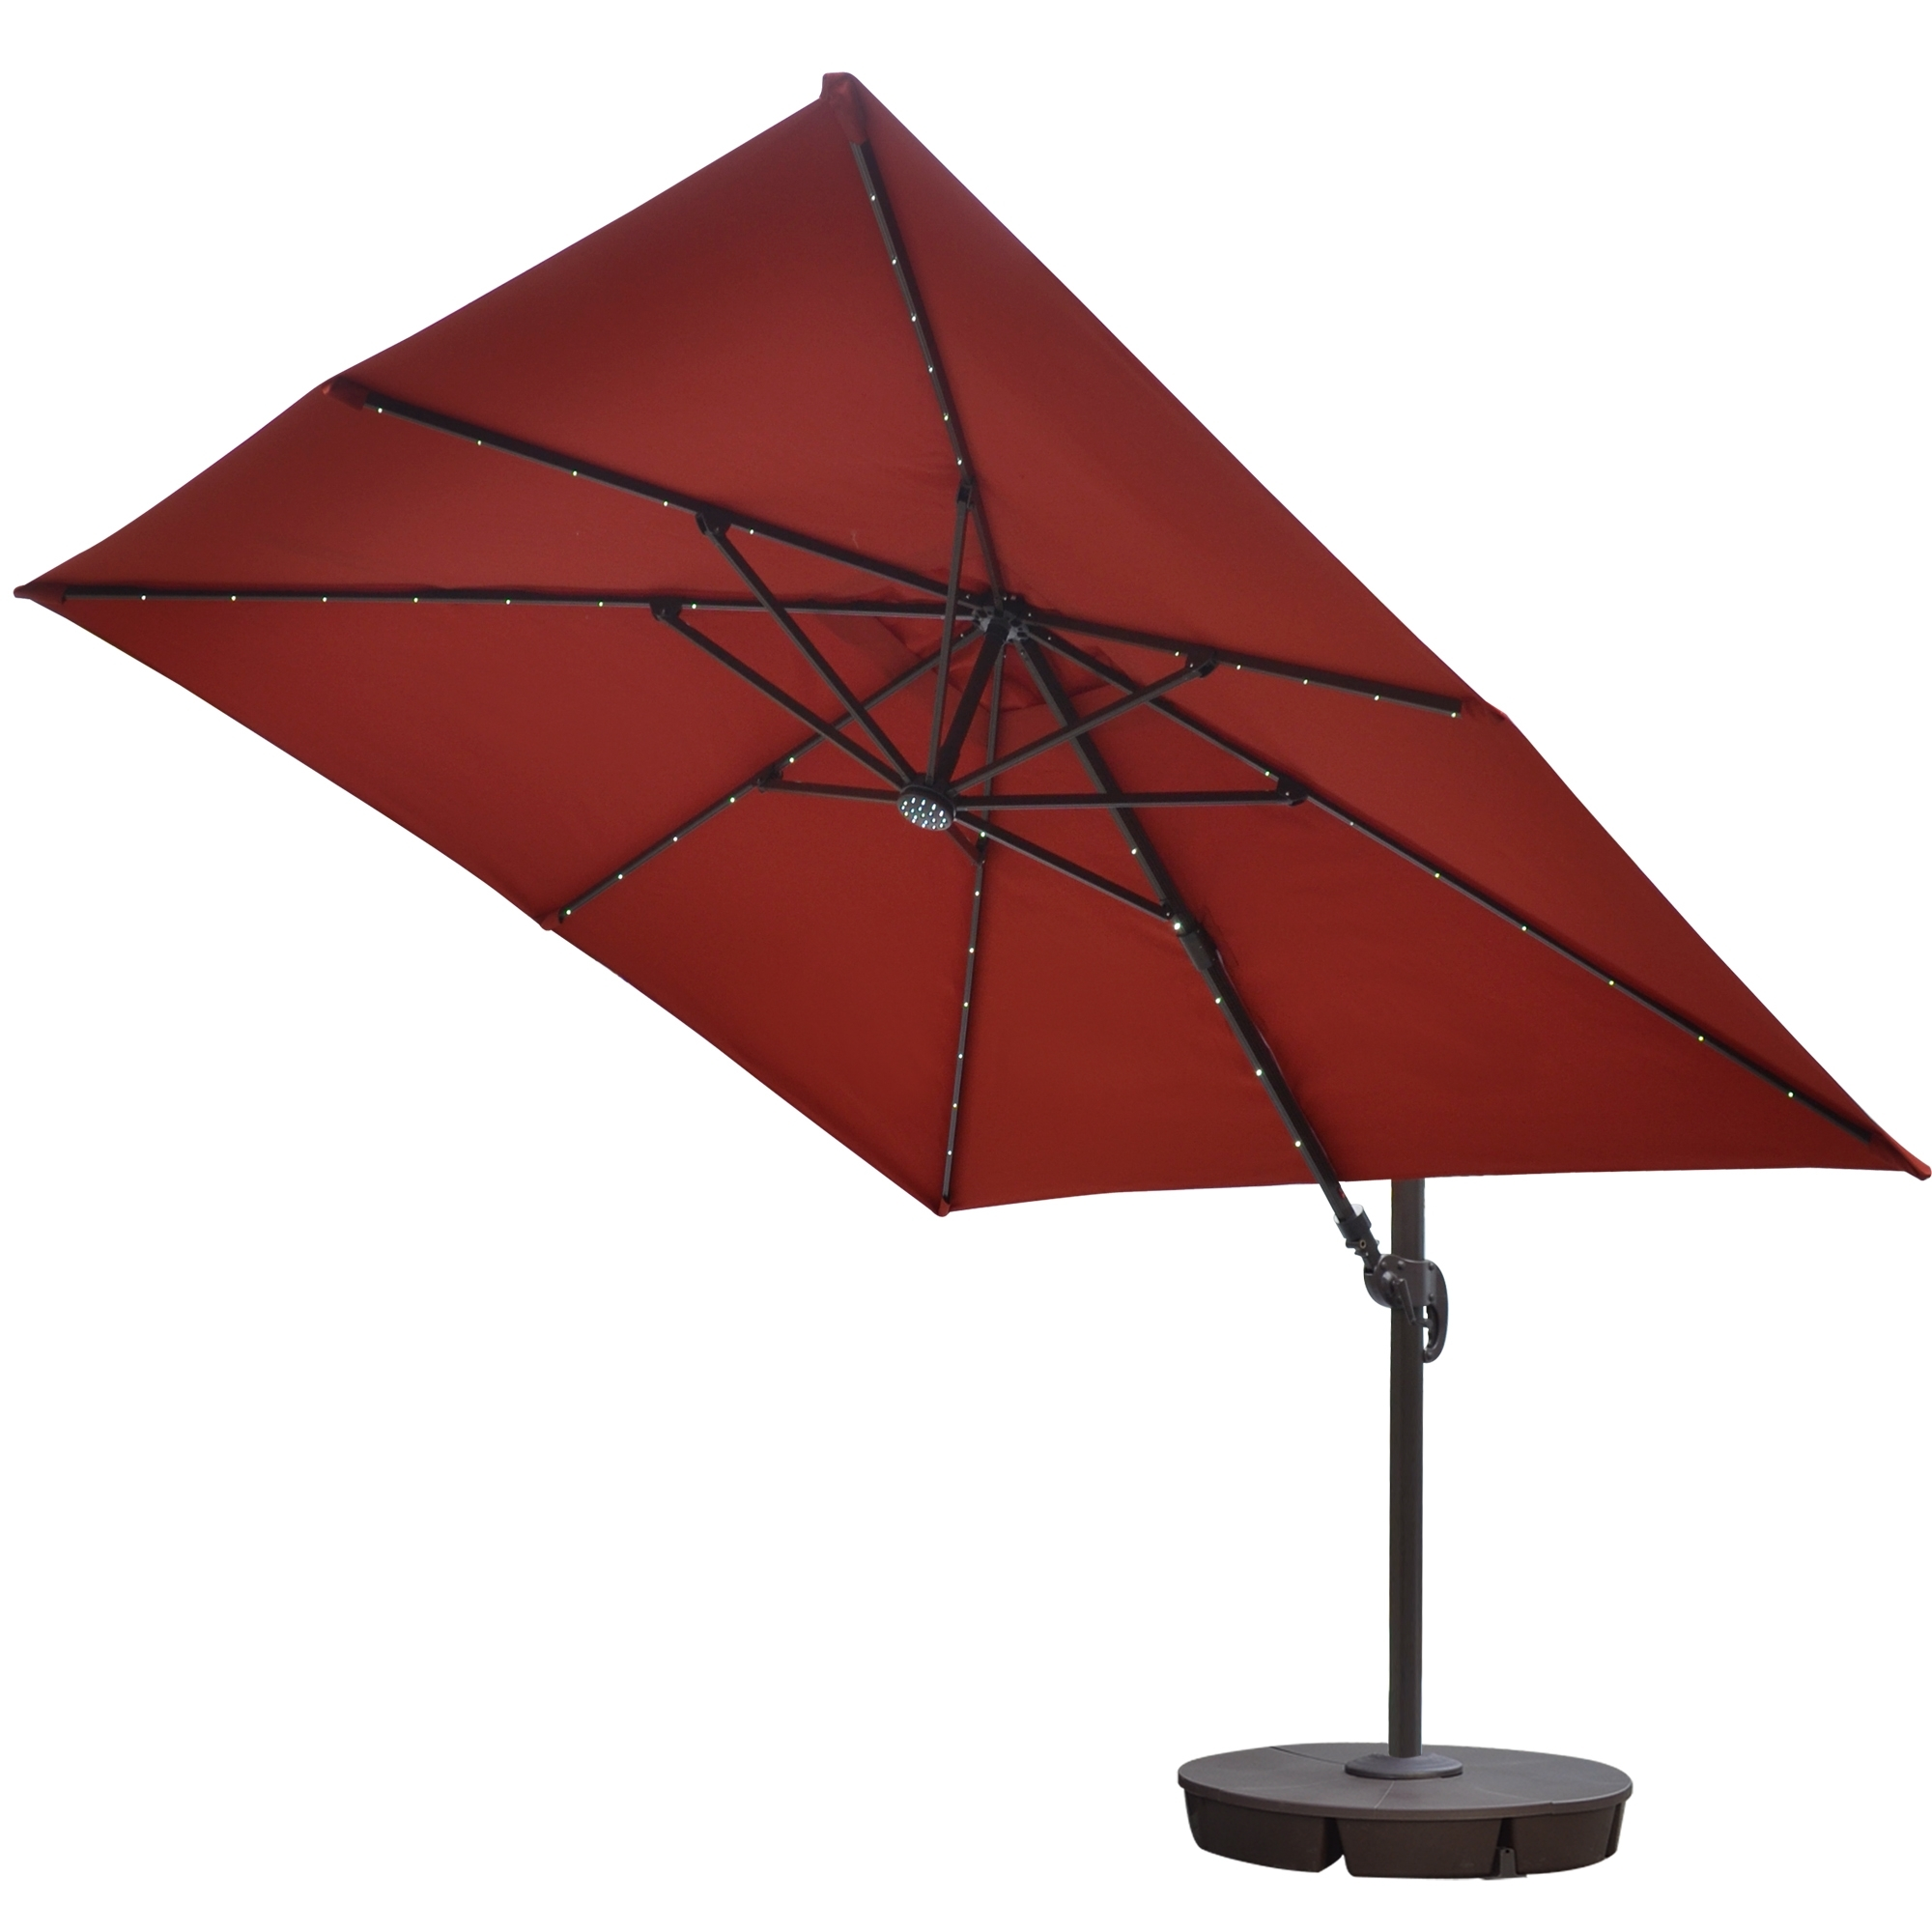 Island Umbrella Santorini Ii Fiesta 10 Ft Square Cantilever Solar Throughout Trendy Square Sunbrella Patio Umbrellas (View 10 of 20)